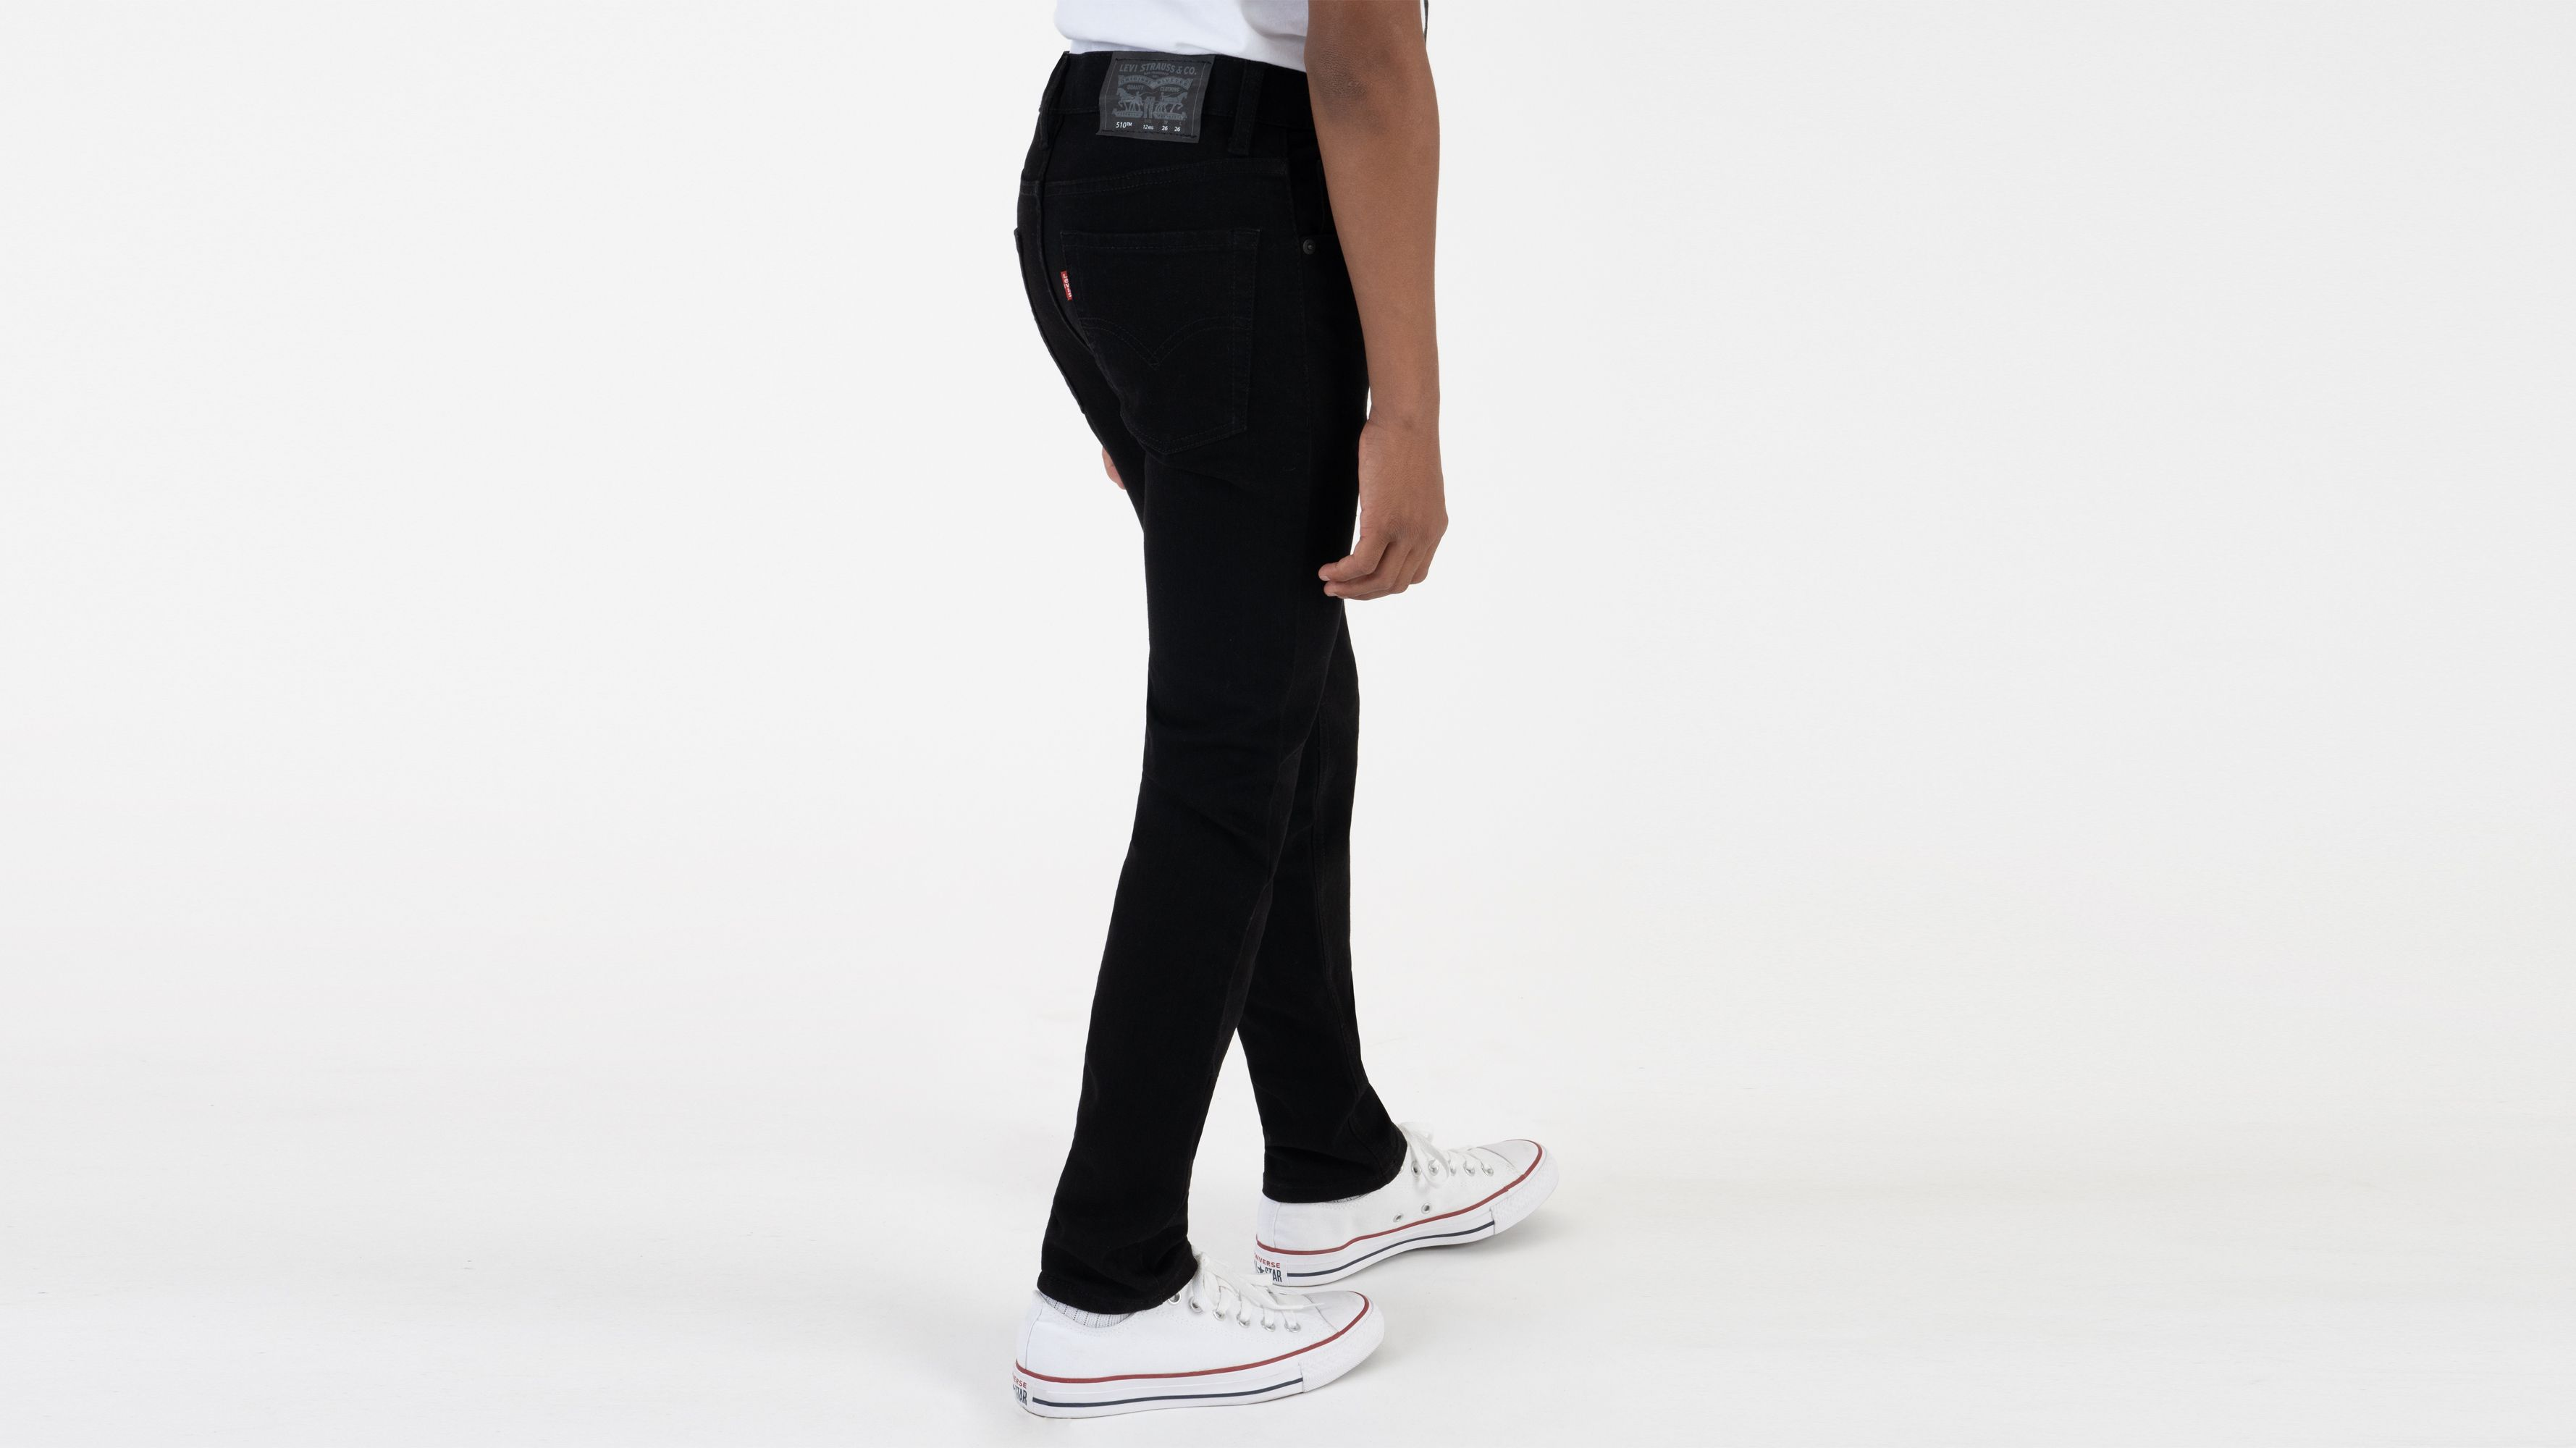 Brand New Boys Size 8 Fashion Denim Distressed Rips Moto Biker White Jean Shorts